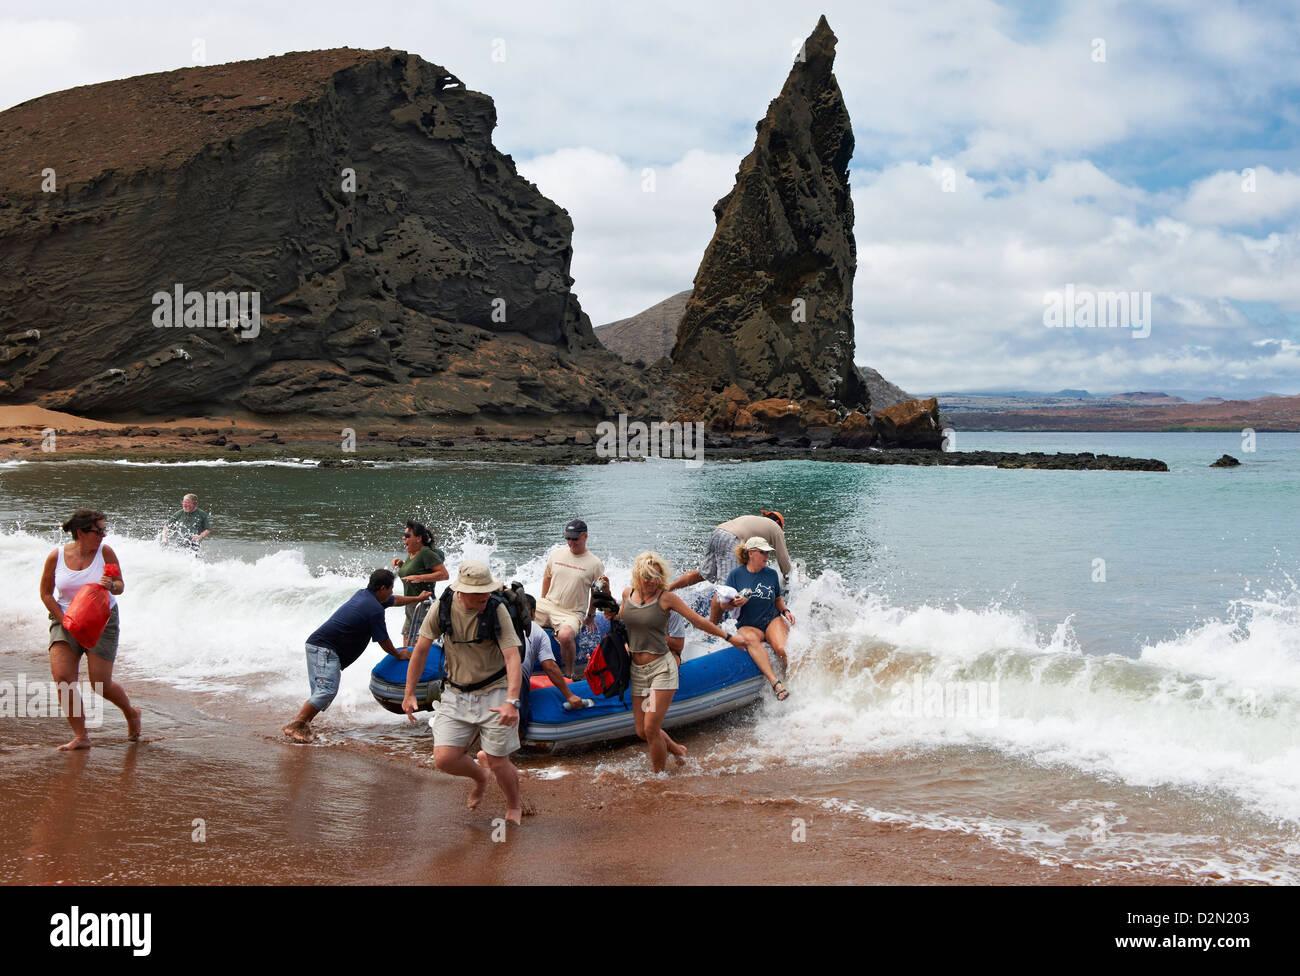 wet landing, vulcanic landscape of Isla Bartolome, Galapagos Islands, Ecuador - Stock Image